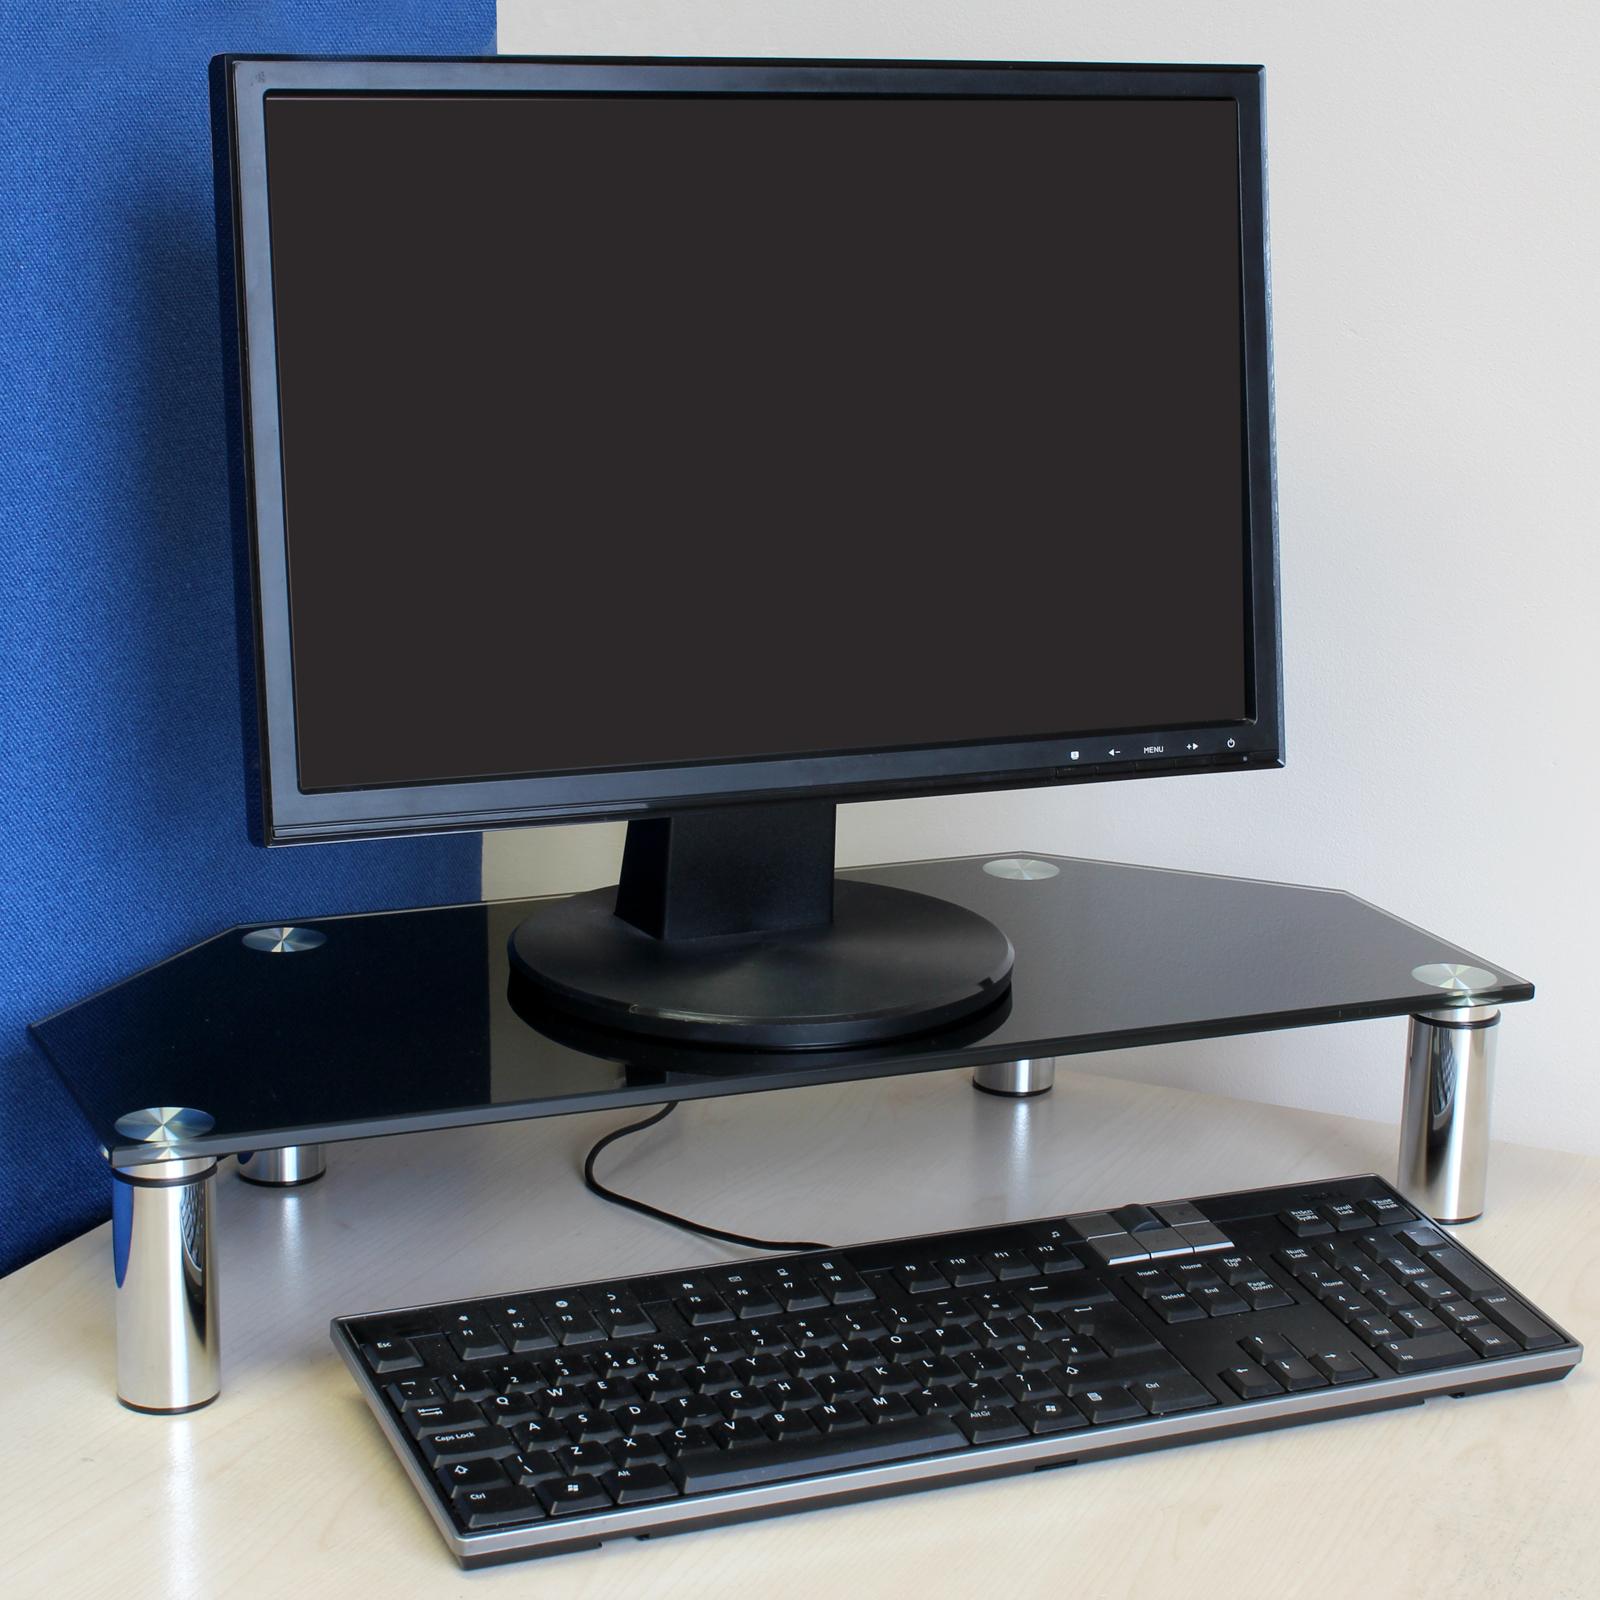 Mac Computer Desk Black Glass Corner Monitor Desk Riser For Computerpcmac Keyboard